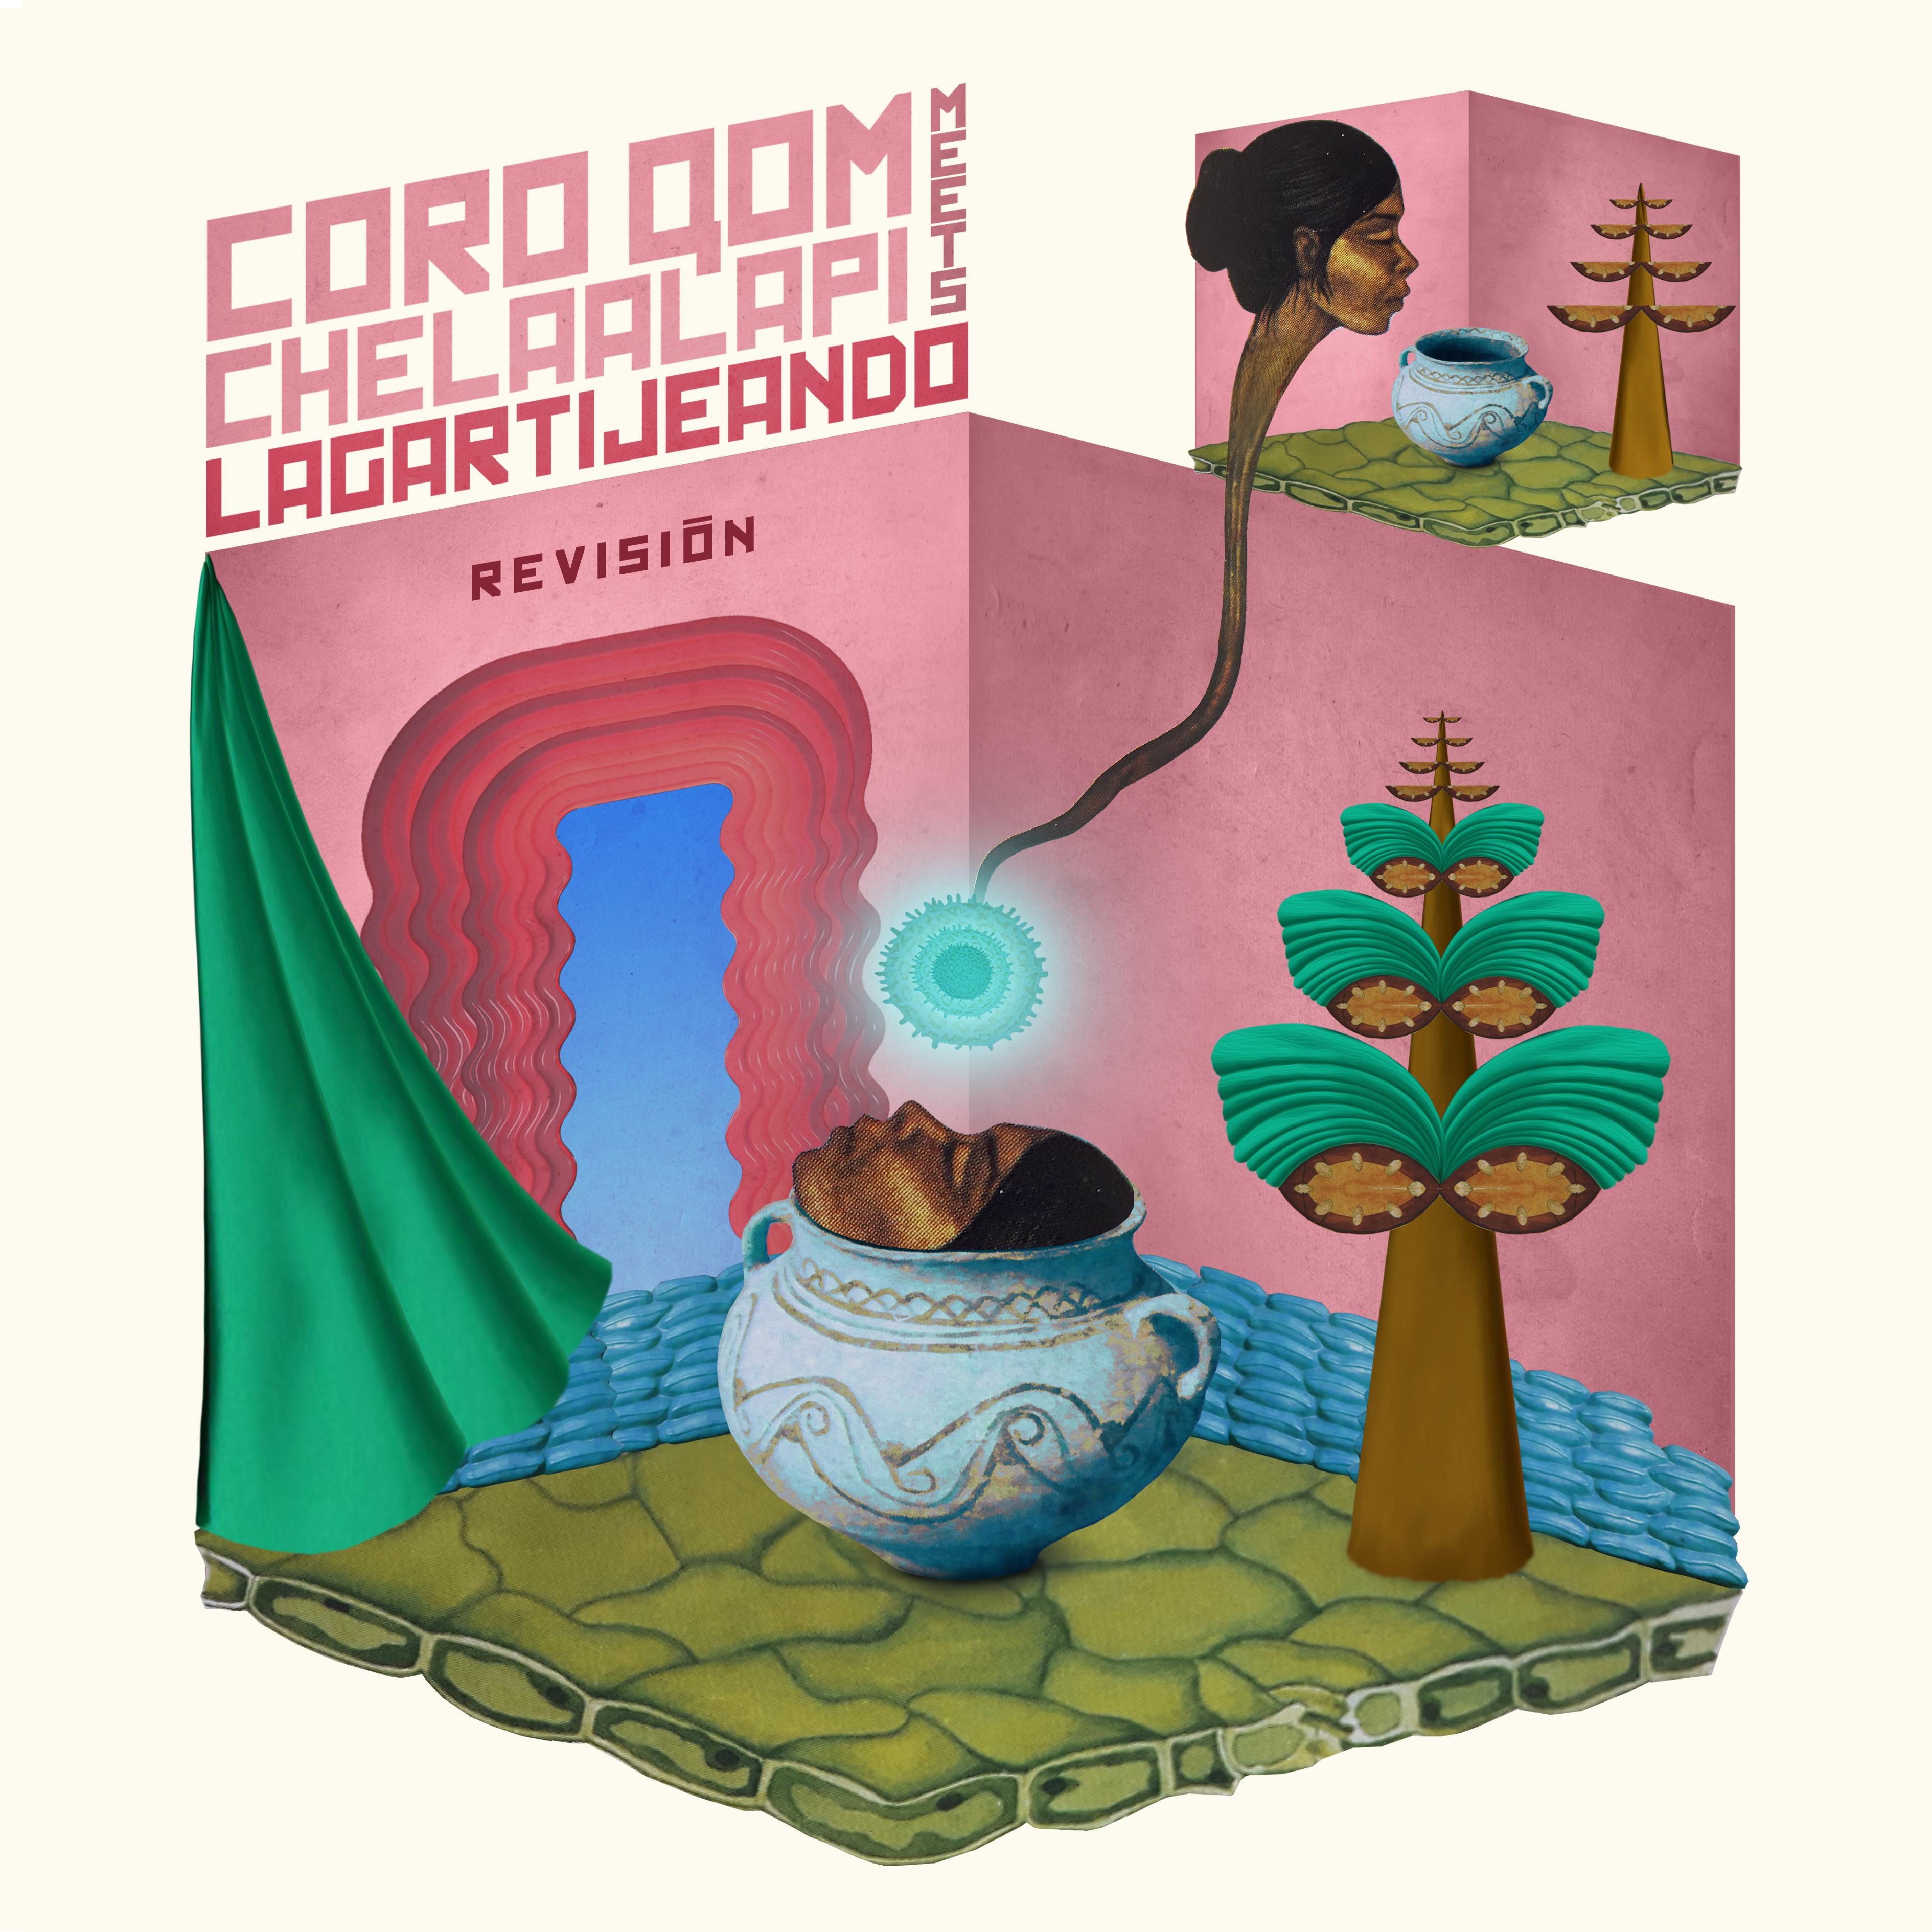 coroqomchelaalapi_meets_lagartijeando_artwork.jpg